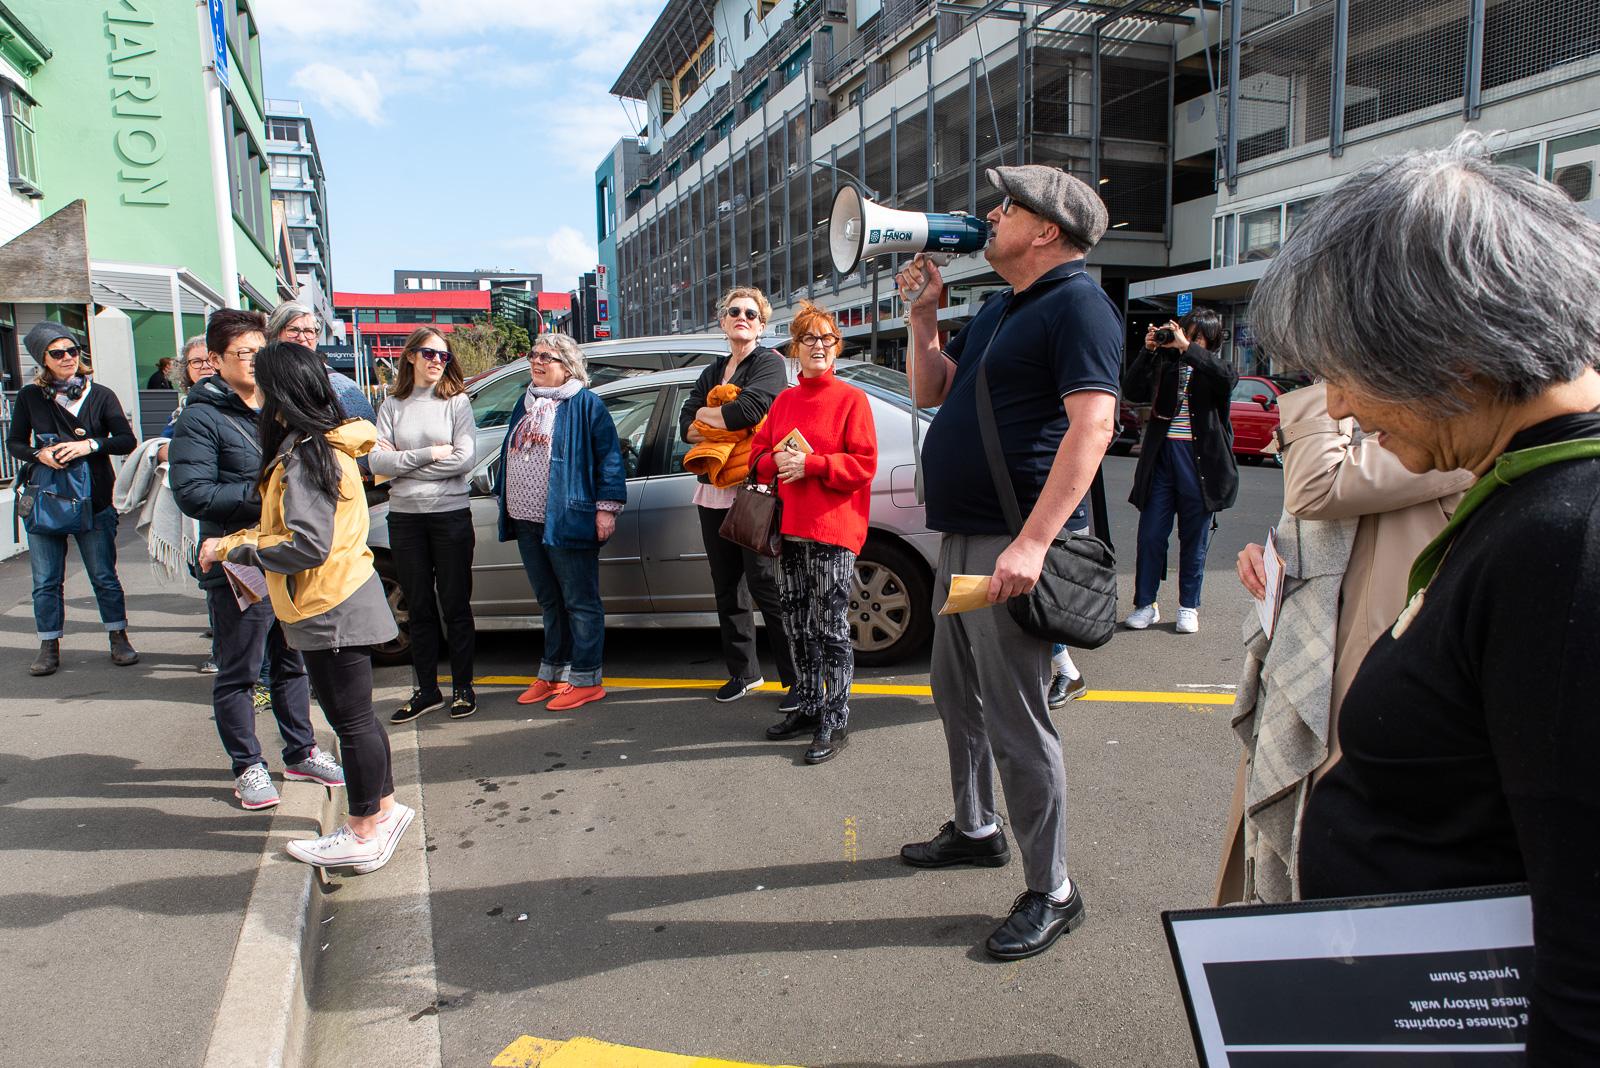 Chinese Footprints Walking tour with historians Lynette Shum & Nigel Murphy 16 September 2018. Photo by John Lake